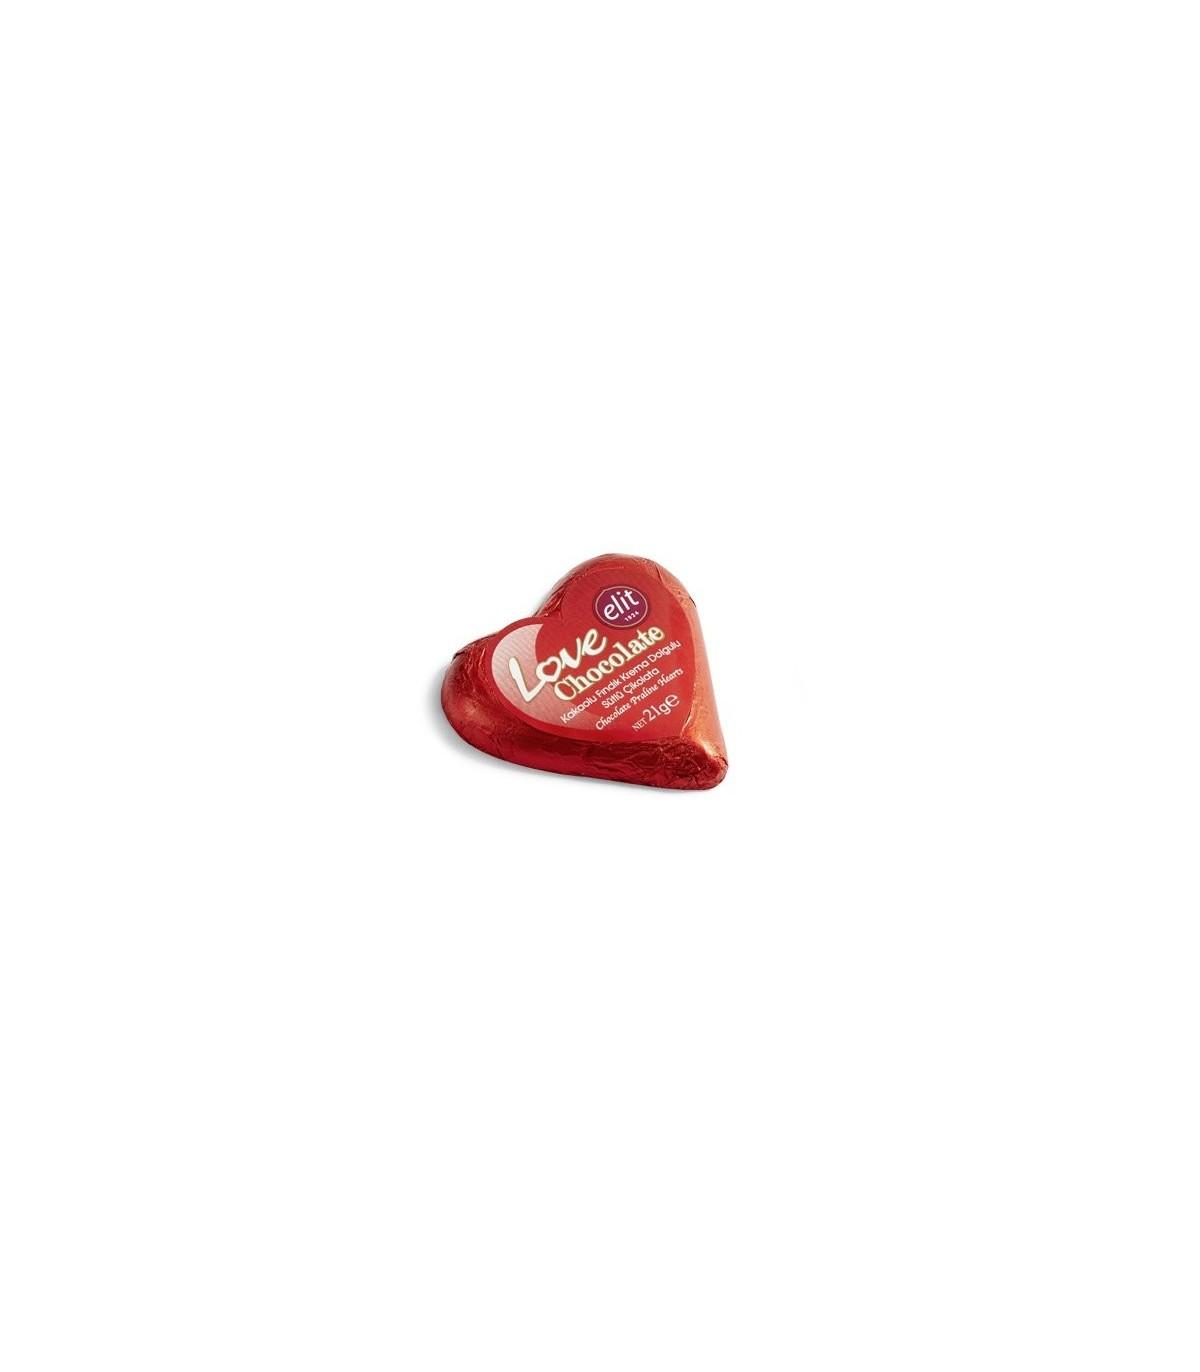 Elit شکلات شیری قلب 21 گرمی الیت